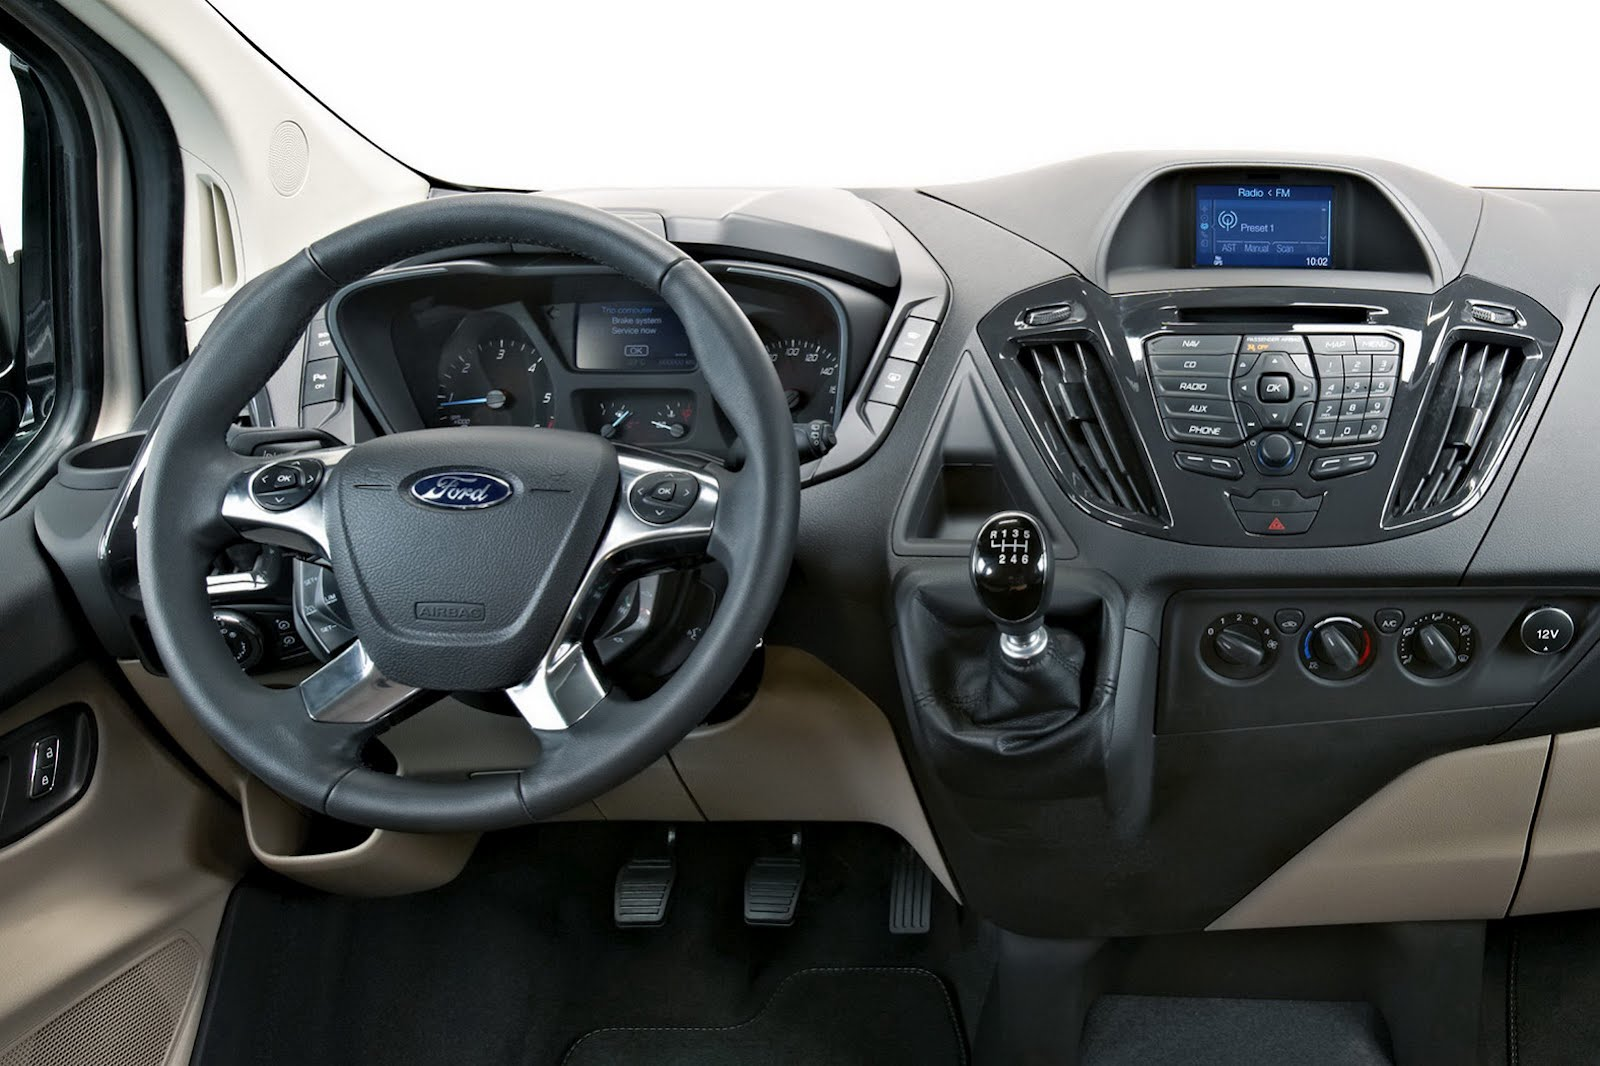 Ford Transit 2012 foto - 3